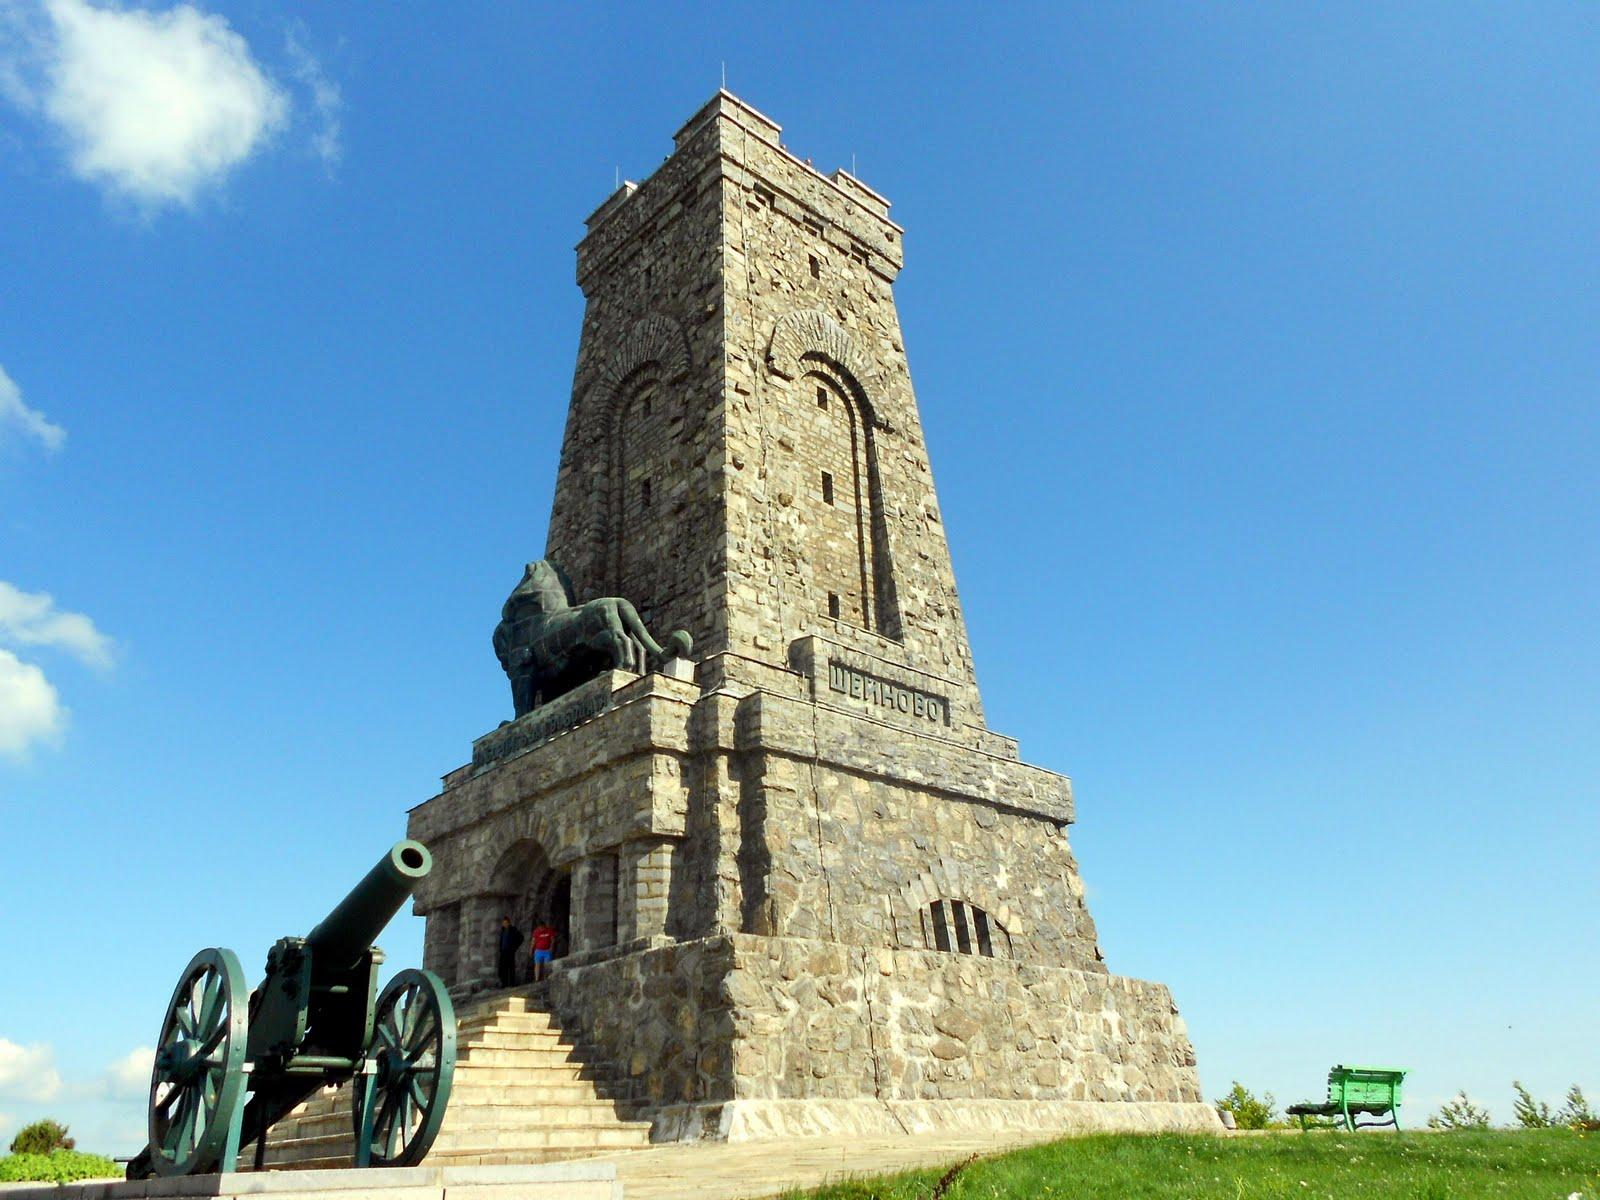 Shipka_memorial_stone-of-Russian-Turkish-war-and-liberation-of-Bulgaria